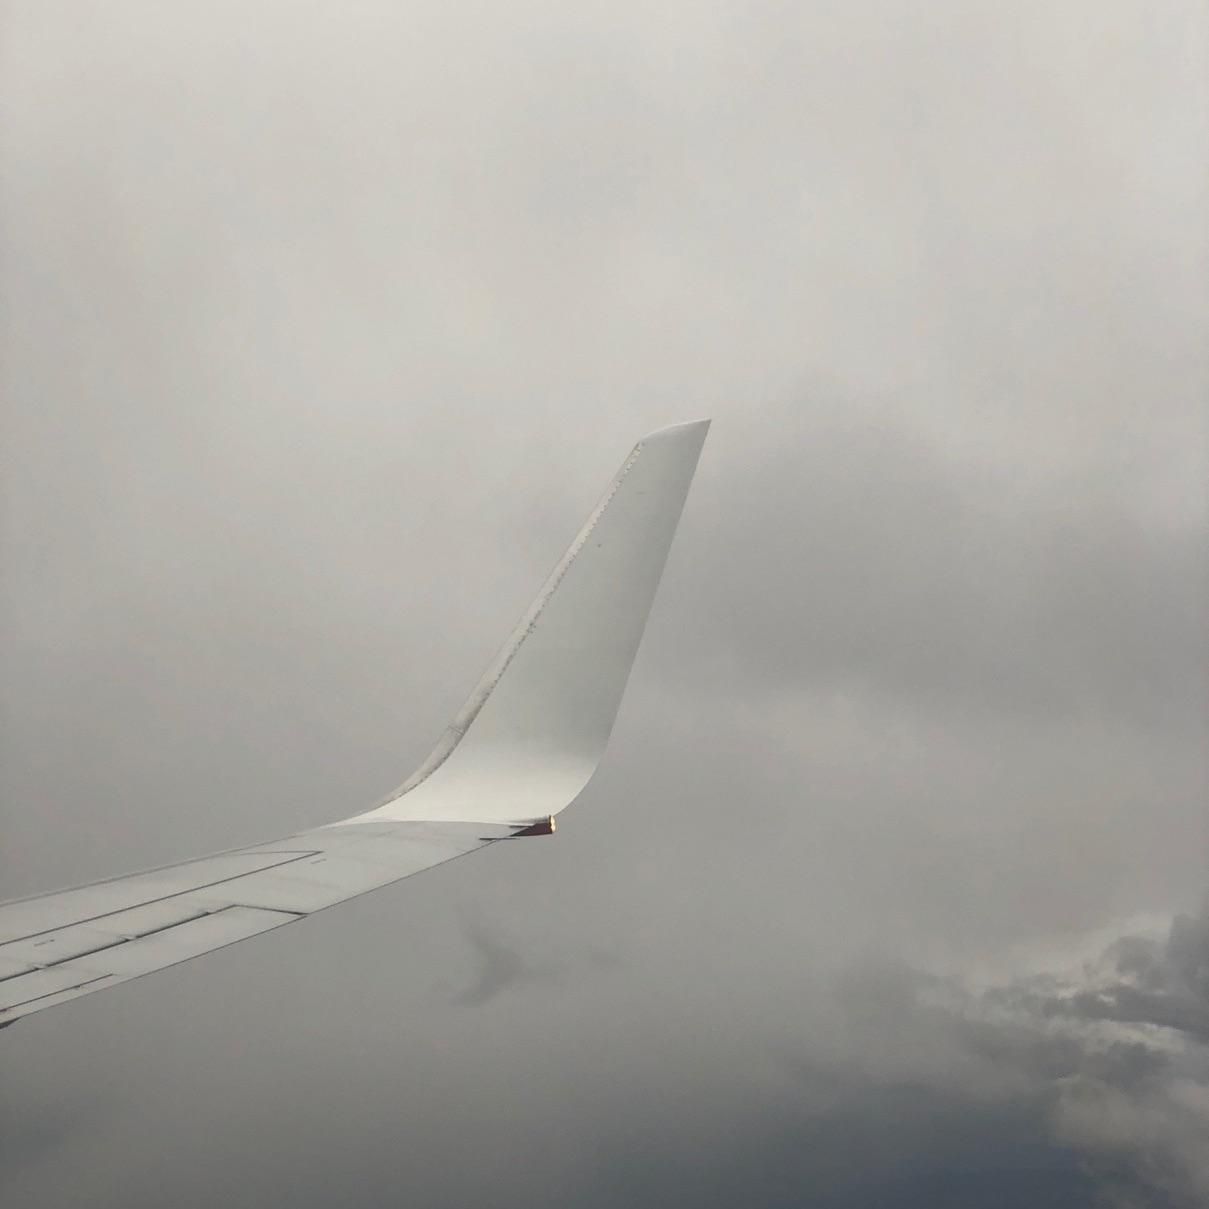 plane-wing-9.jpg